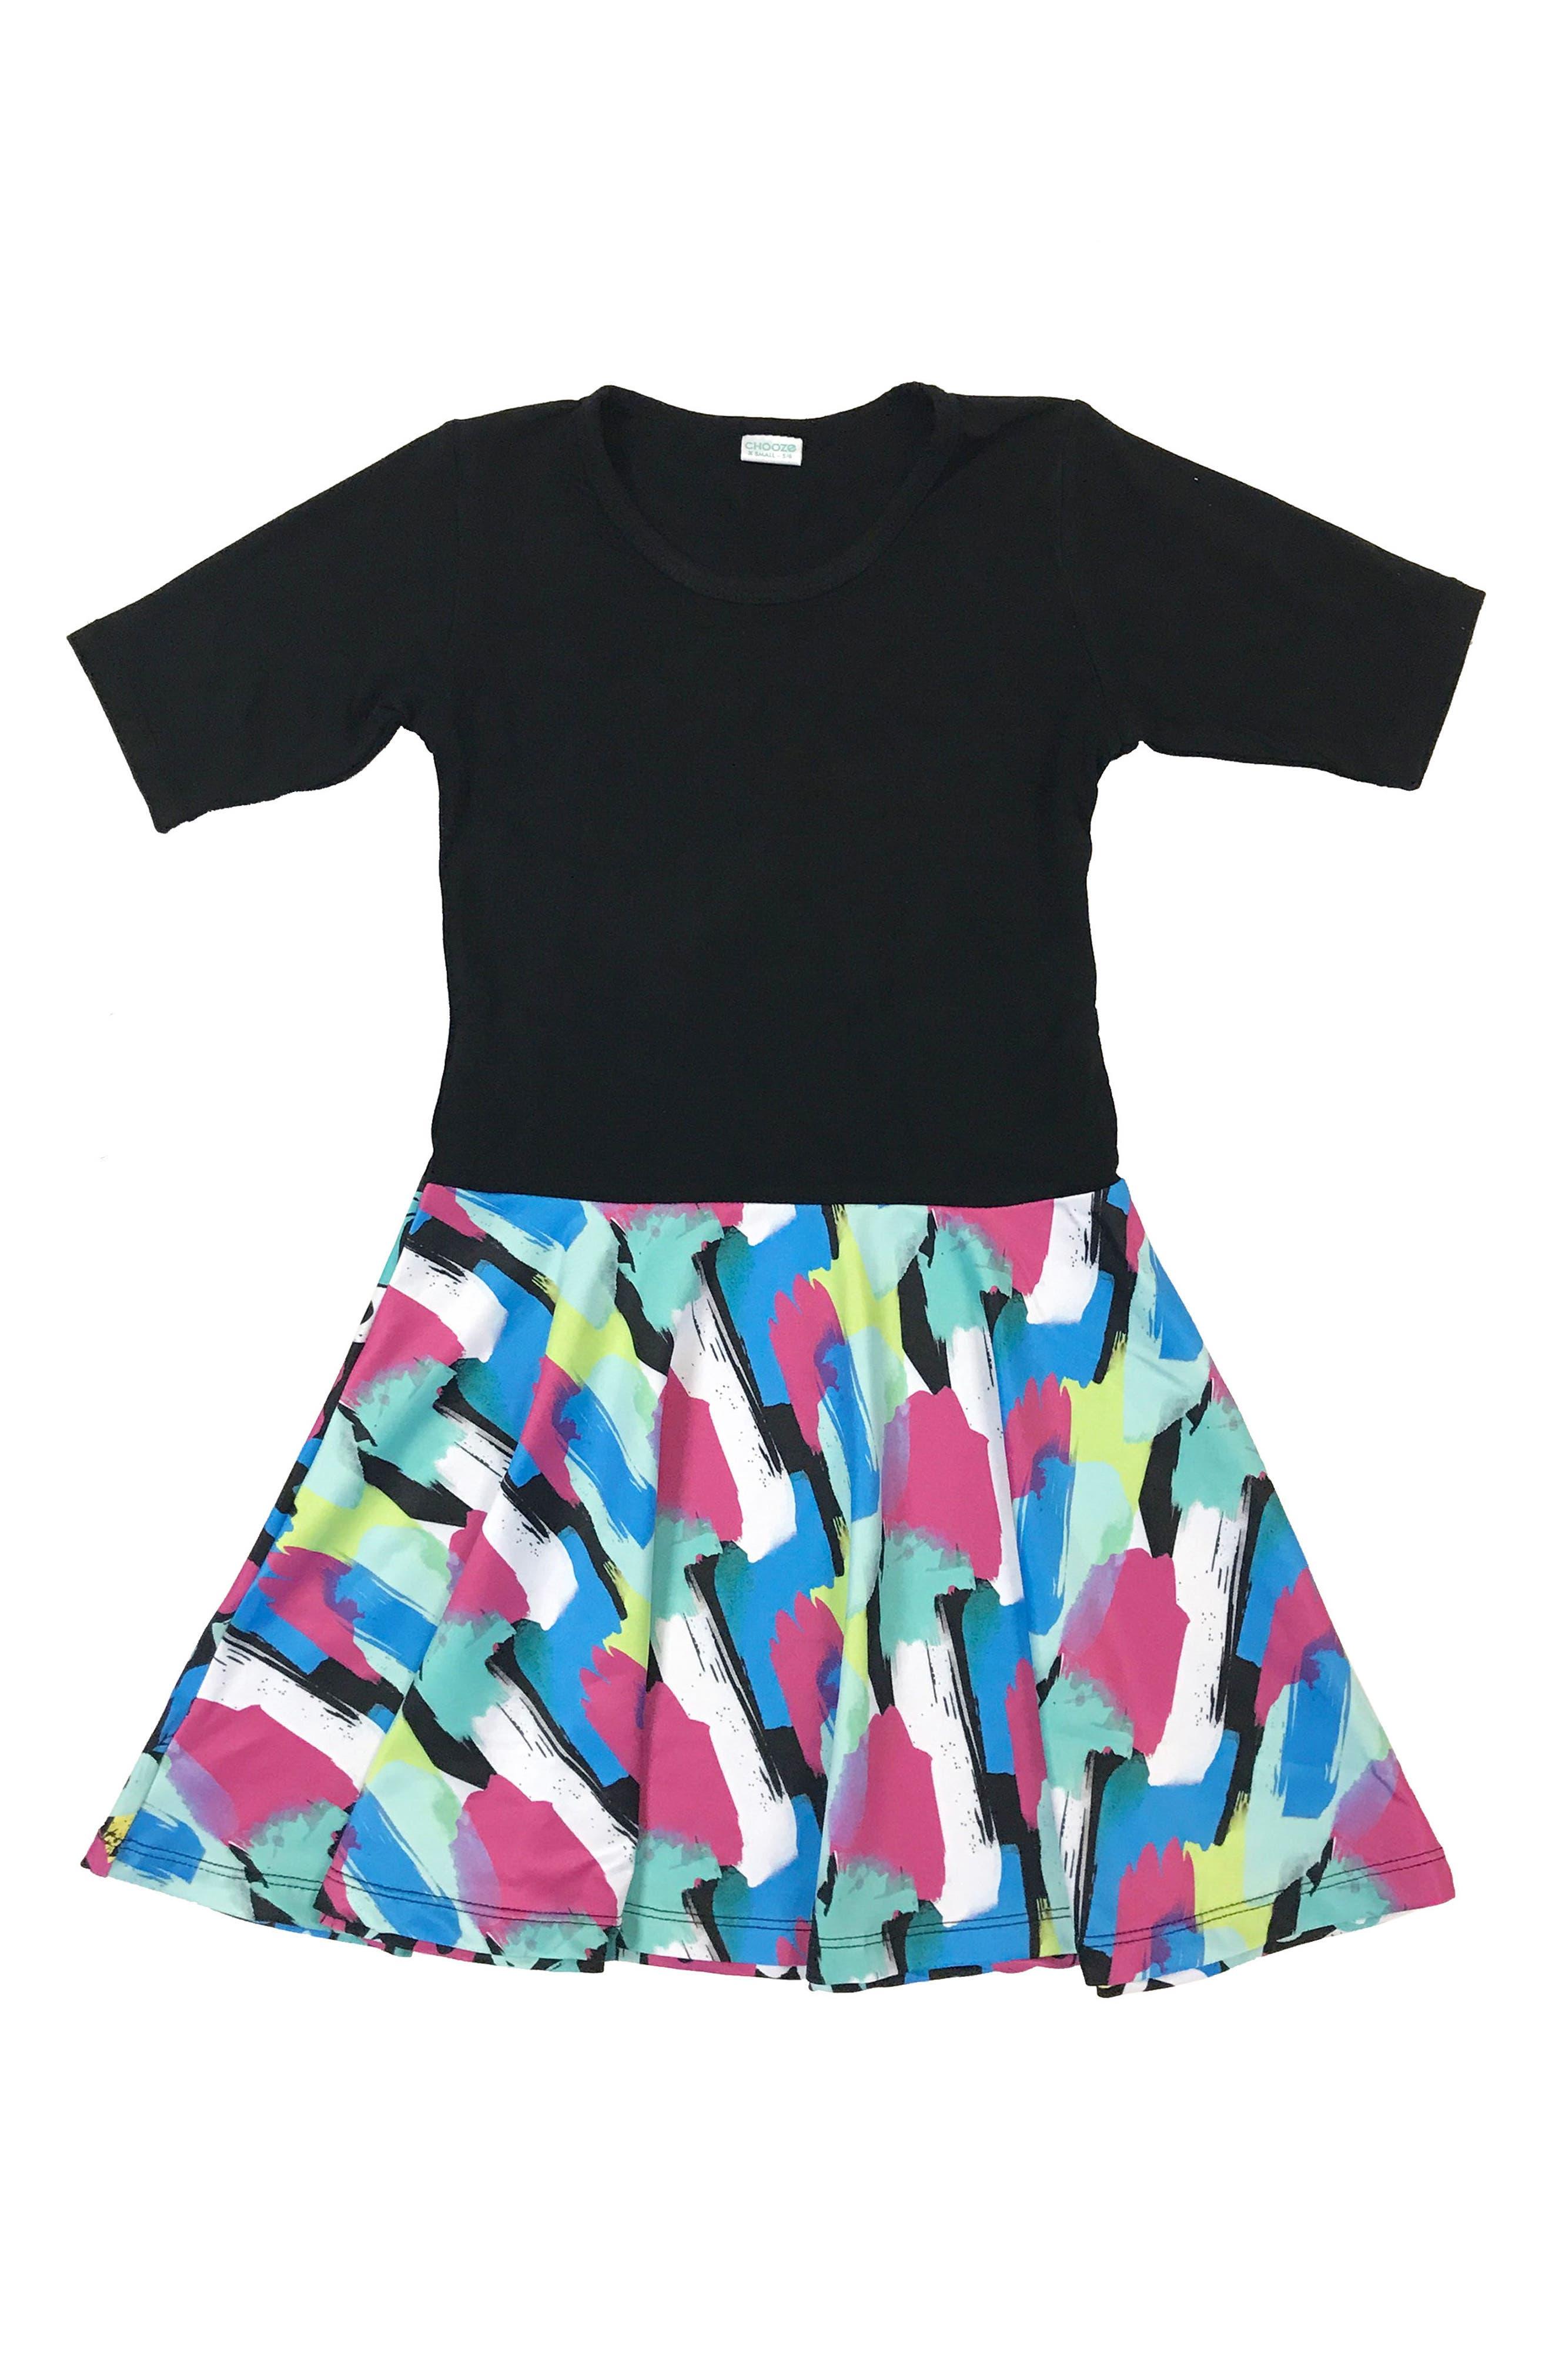 Main Image - CHOOZE Spree Mixed Print Dress (Little Girls & Big Girls)